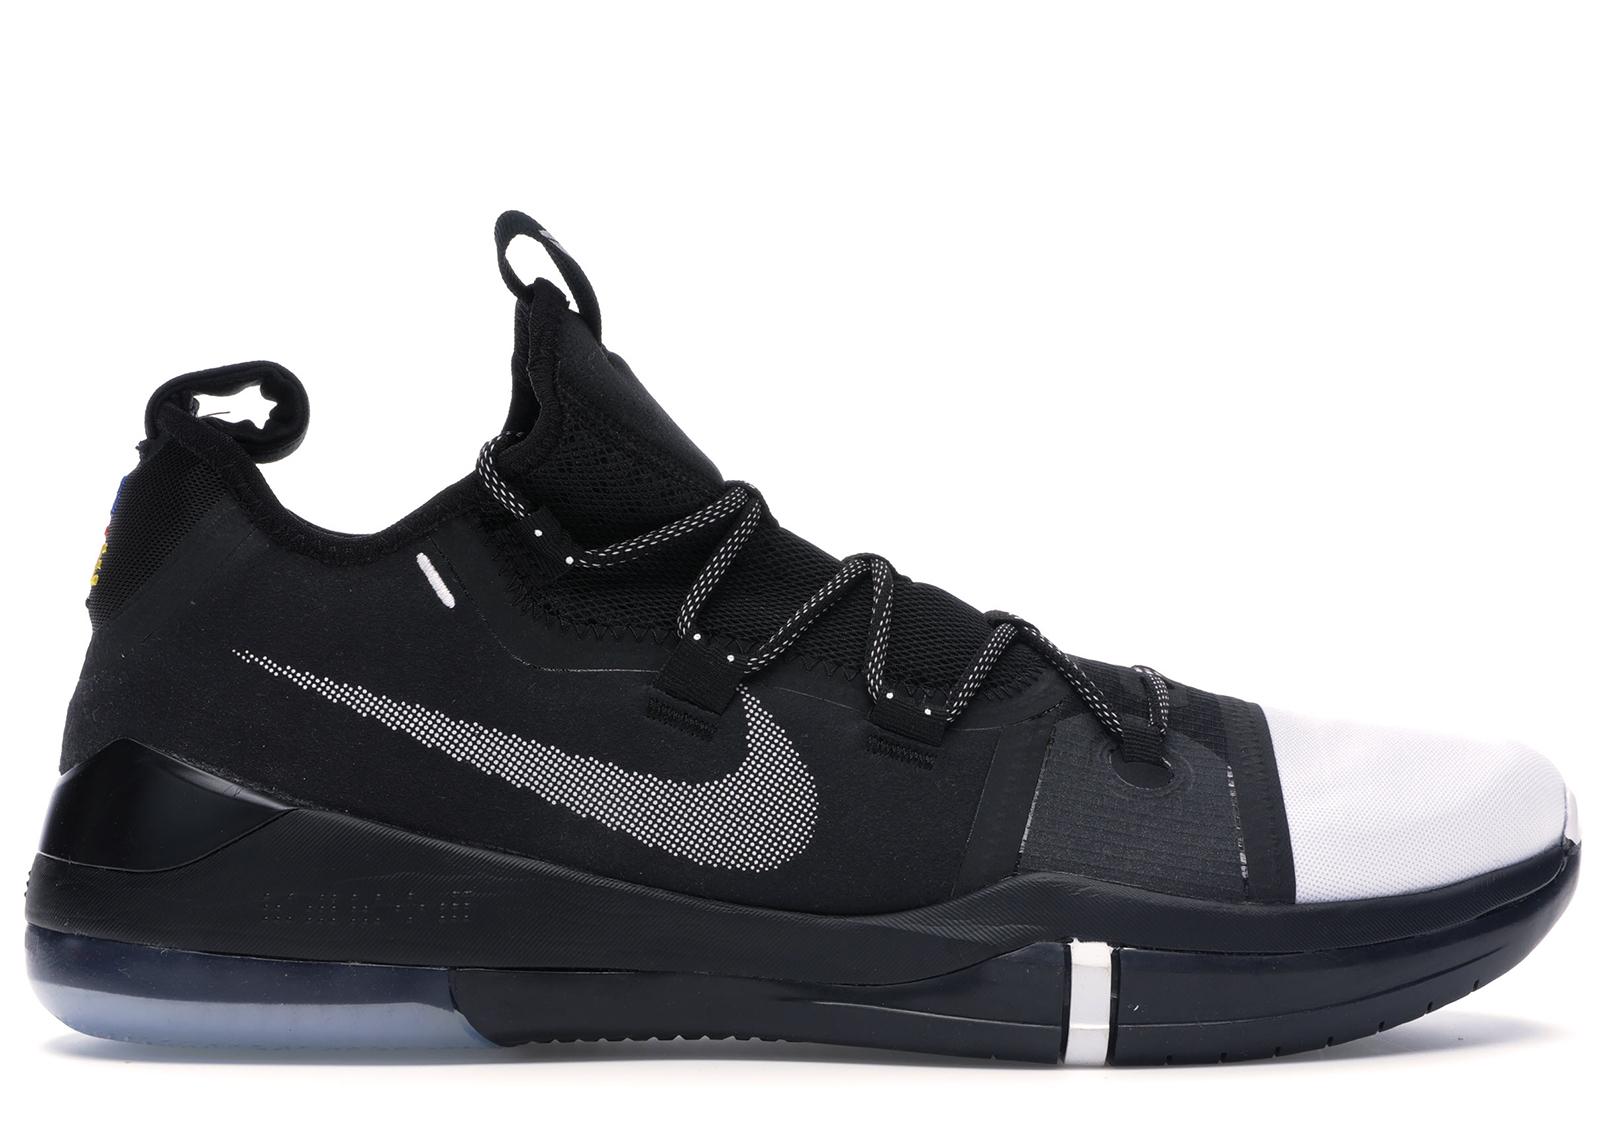 Nike Kobe AD Black Toe - AR5515-002